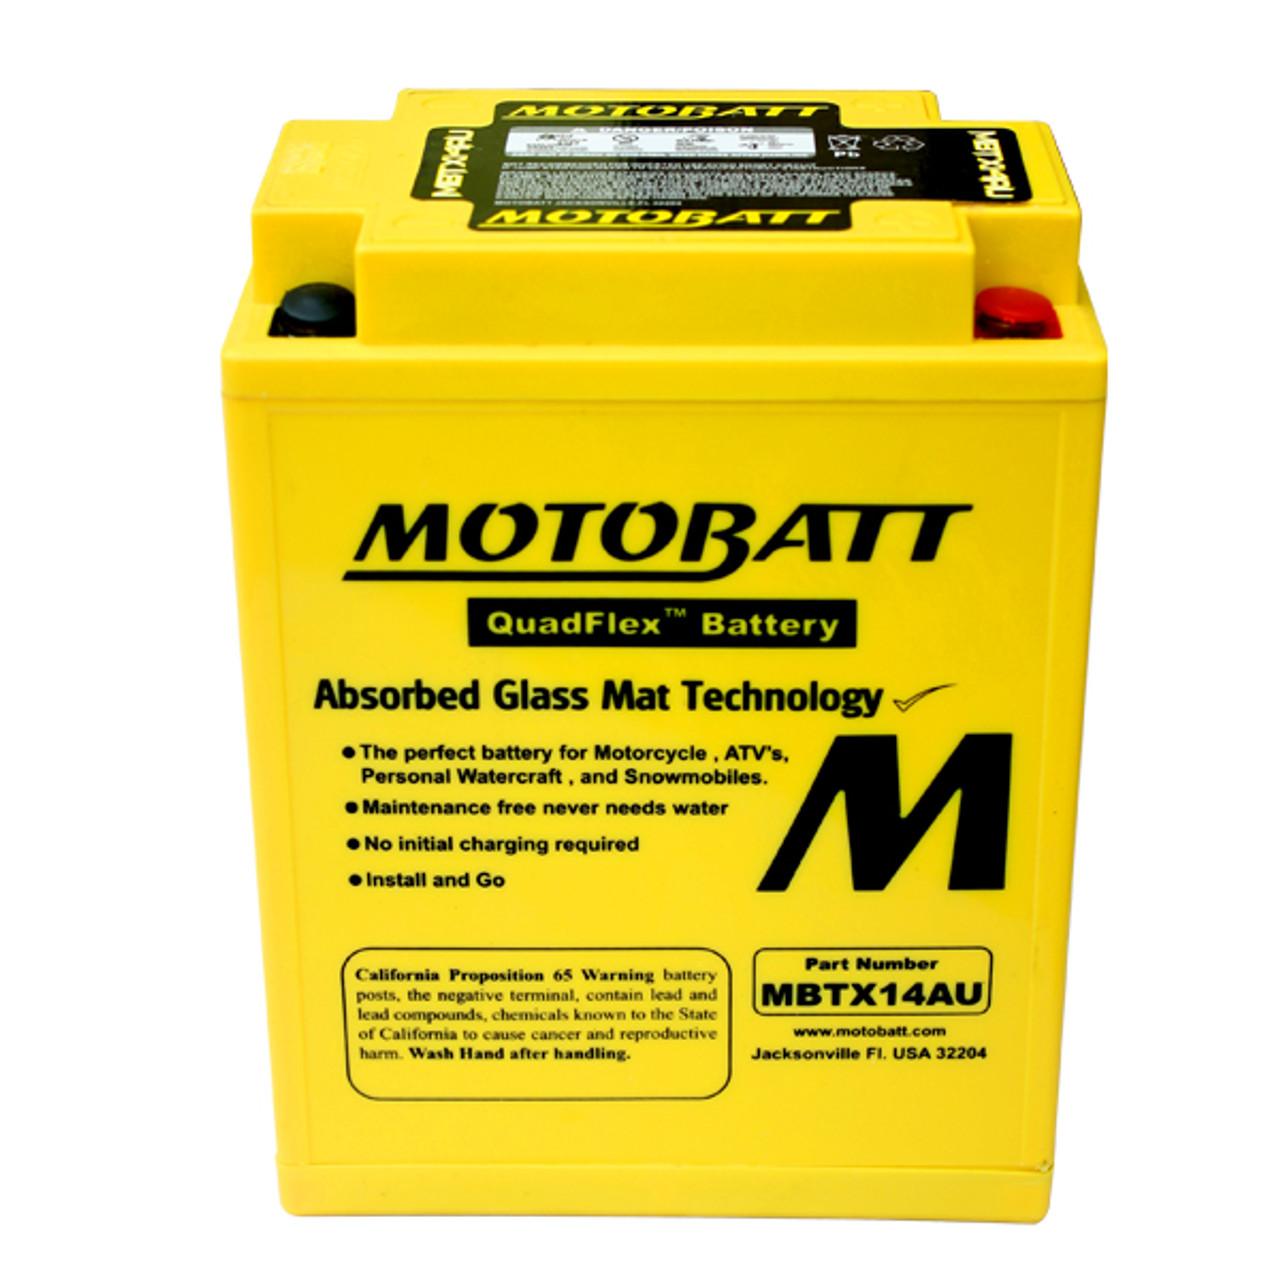 EF Details about  /Battery ES GV71C 84-87- IE YB14L-A2 12V 14AH Suzuki GSX 1100 E,EF,ES GV71C 84-87 data-mtsrclang=en-US href=# onclick=return false; show original title Motorbike Battery YB14L-A2 12V 14AH Suzuki GSX 1100 E